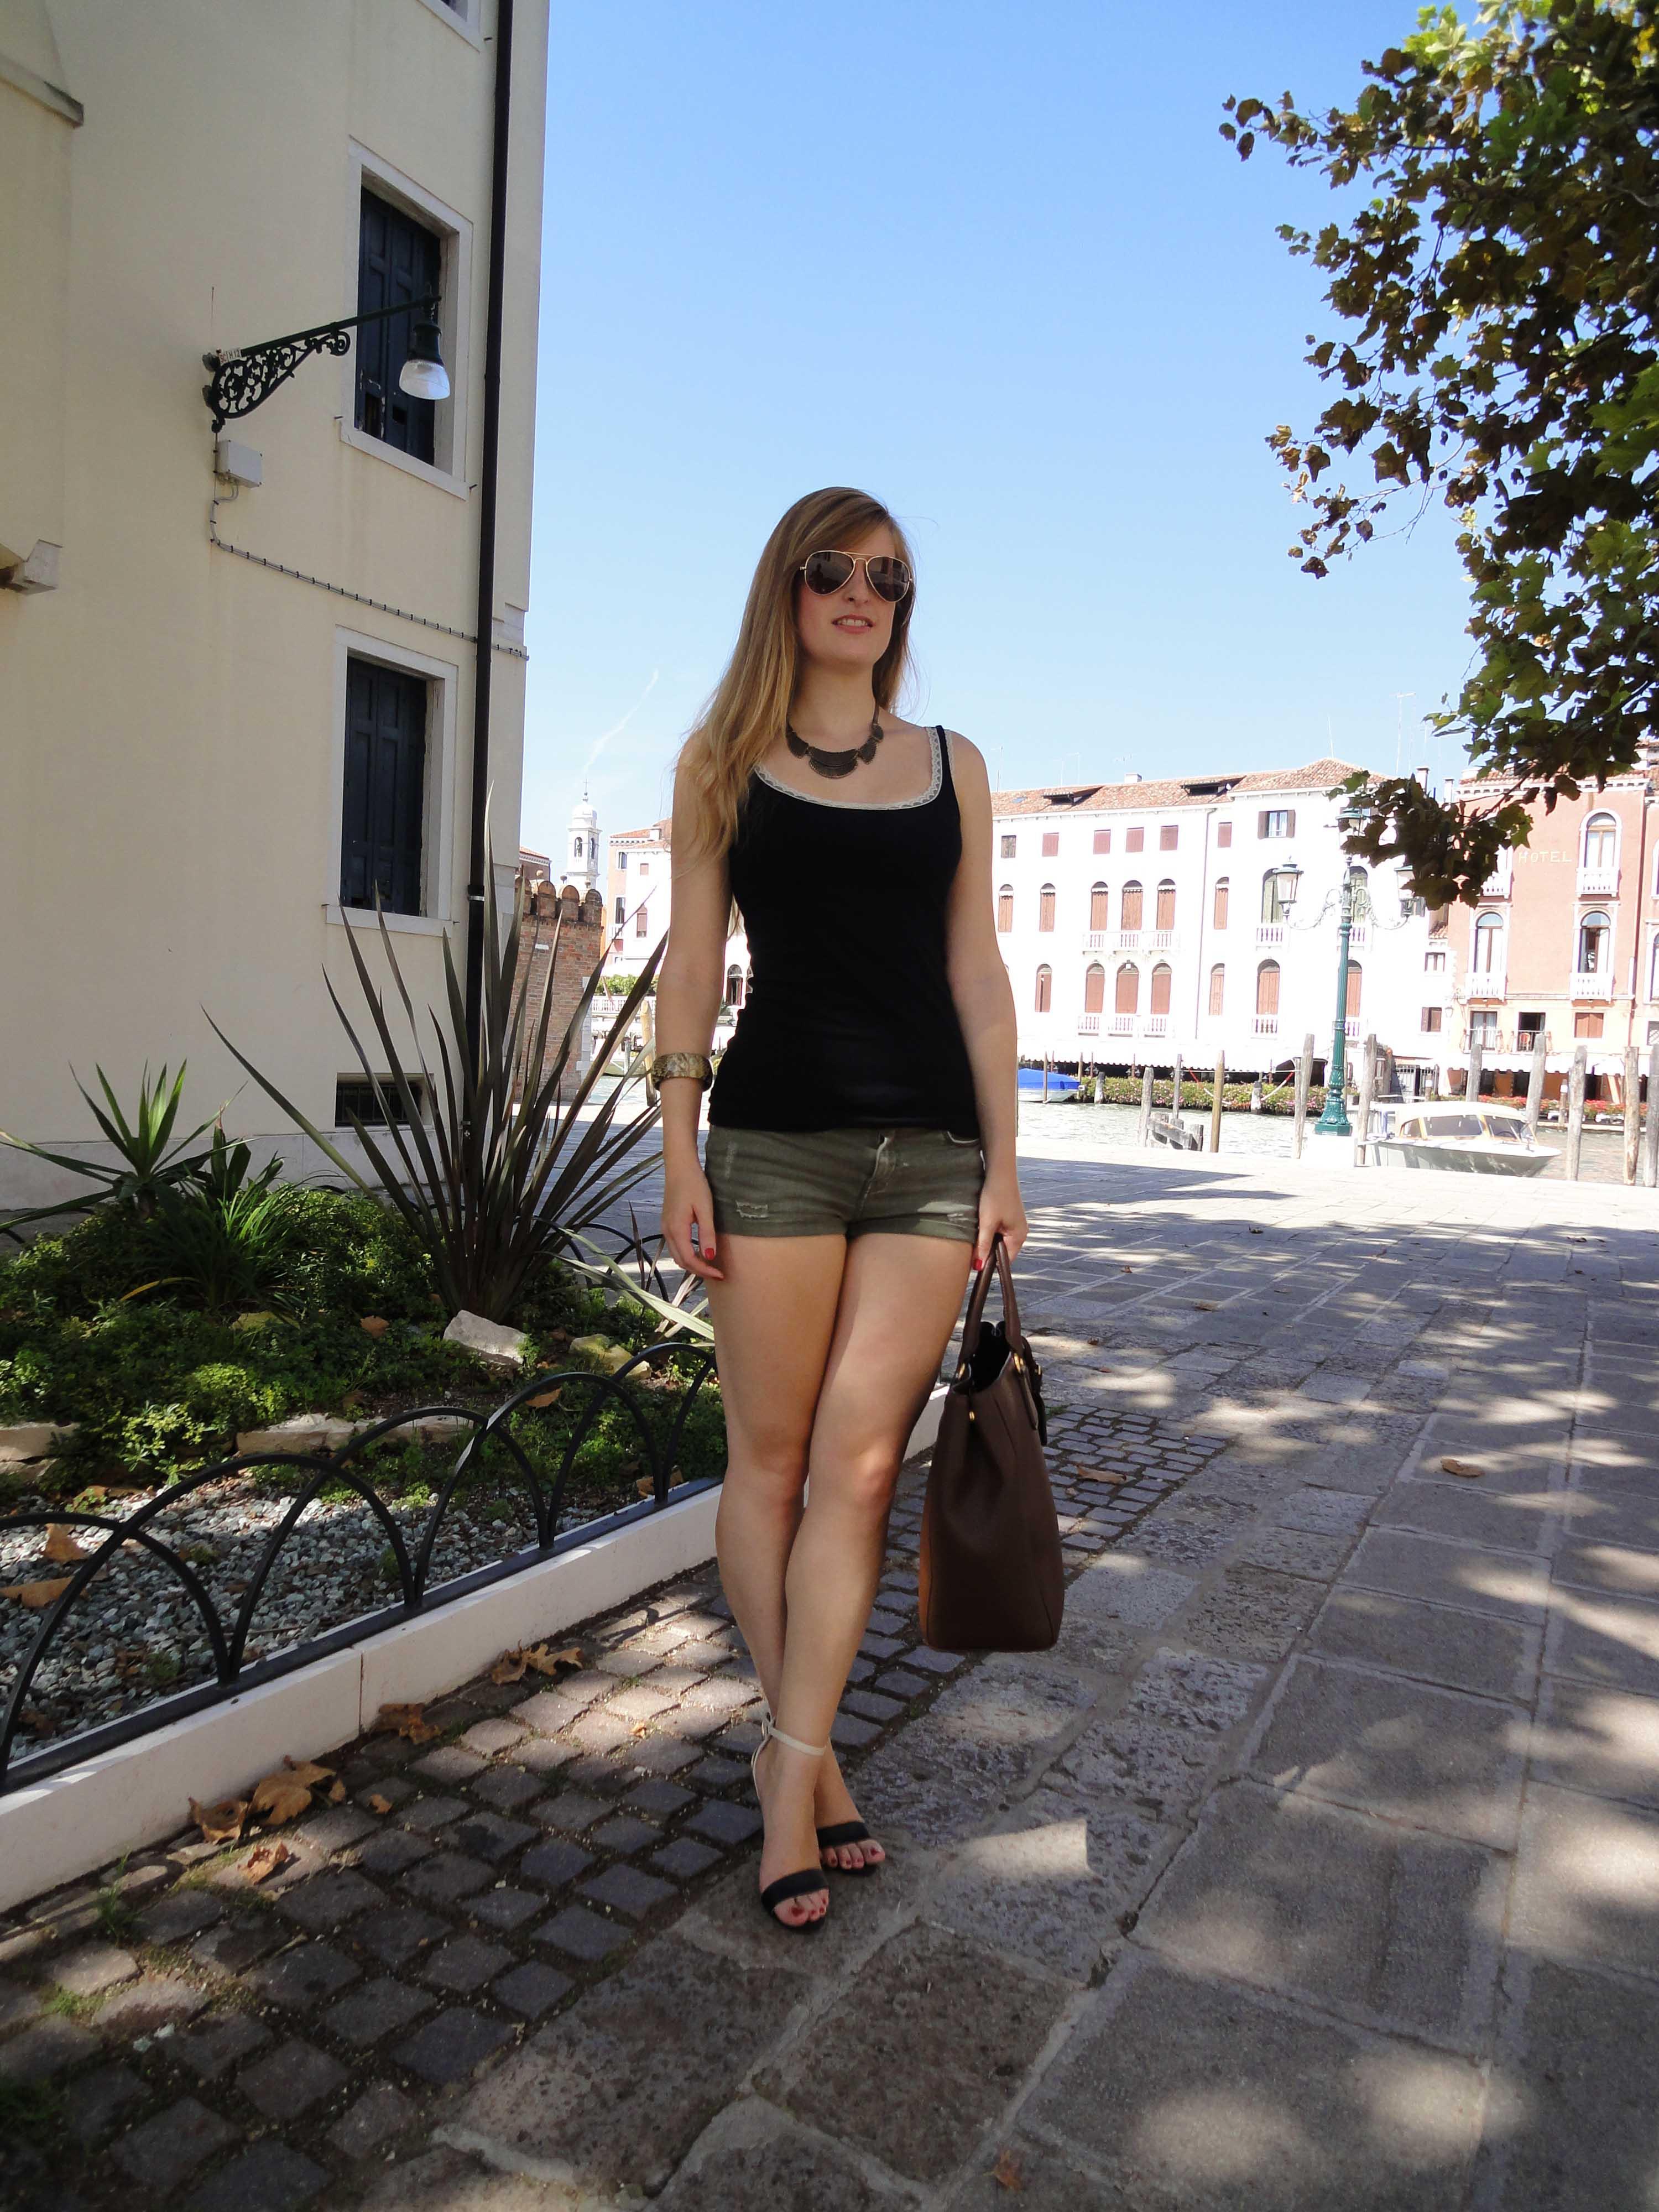 Clasy Simple Outfit Venice Sommerlook Venedig Hotpants grün Spaghettiträger Shirt Heels 2